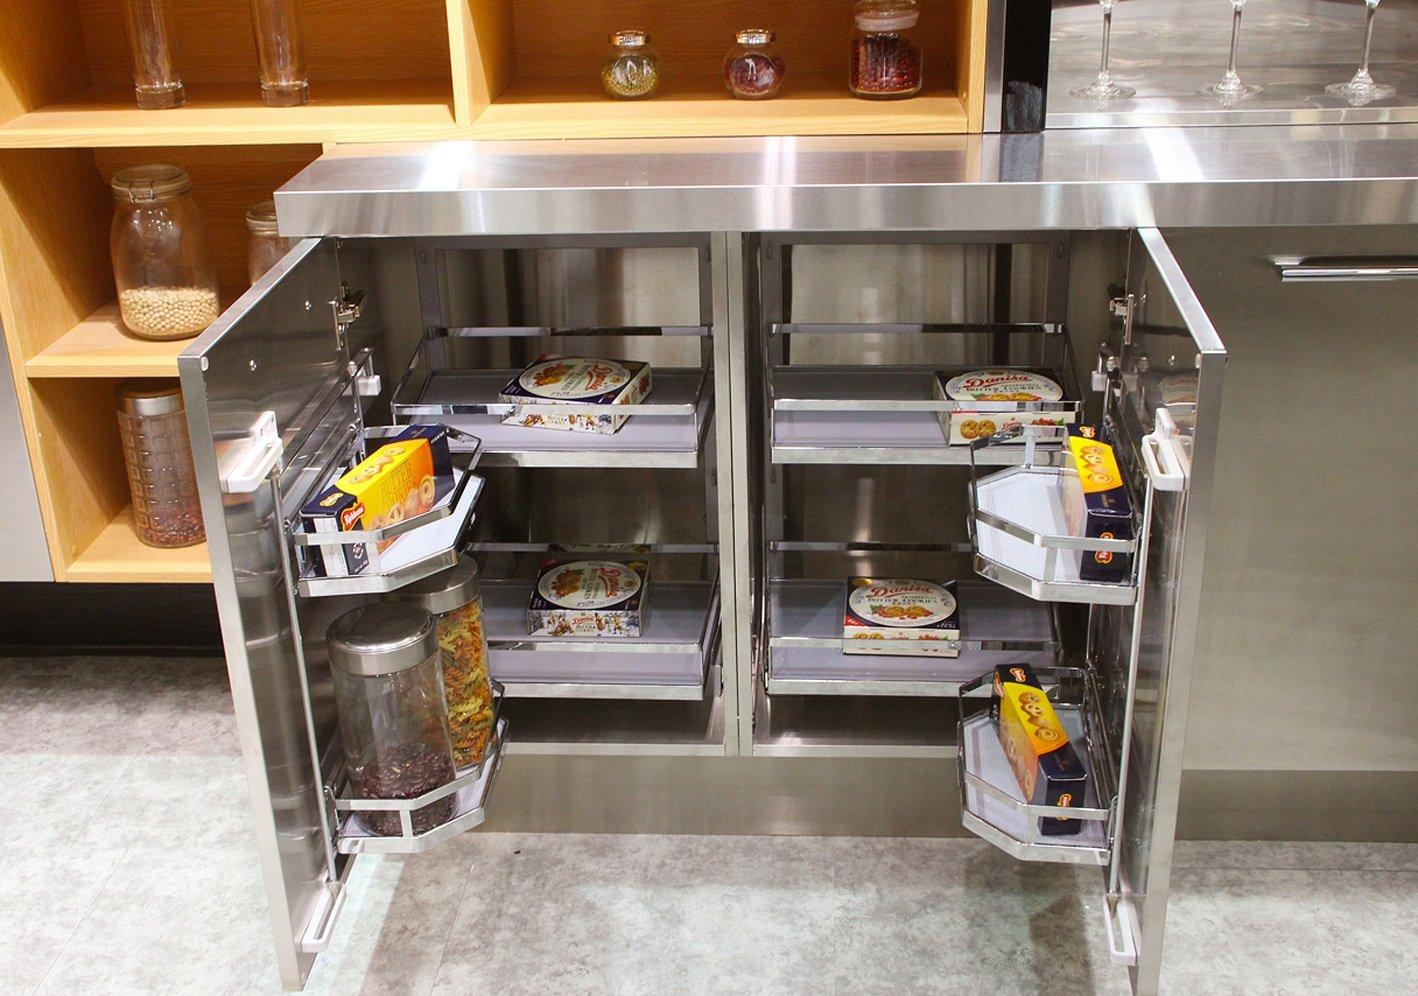 Z006 Caesr - Modern Style Stainless Steel Kitchen with Island